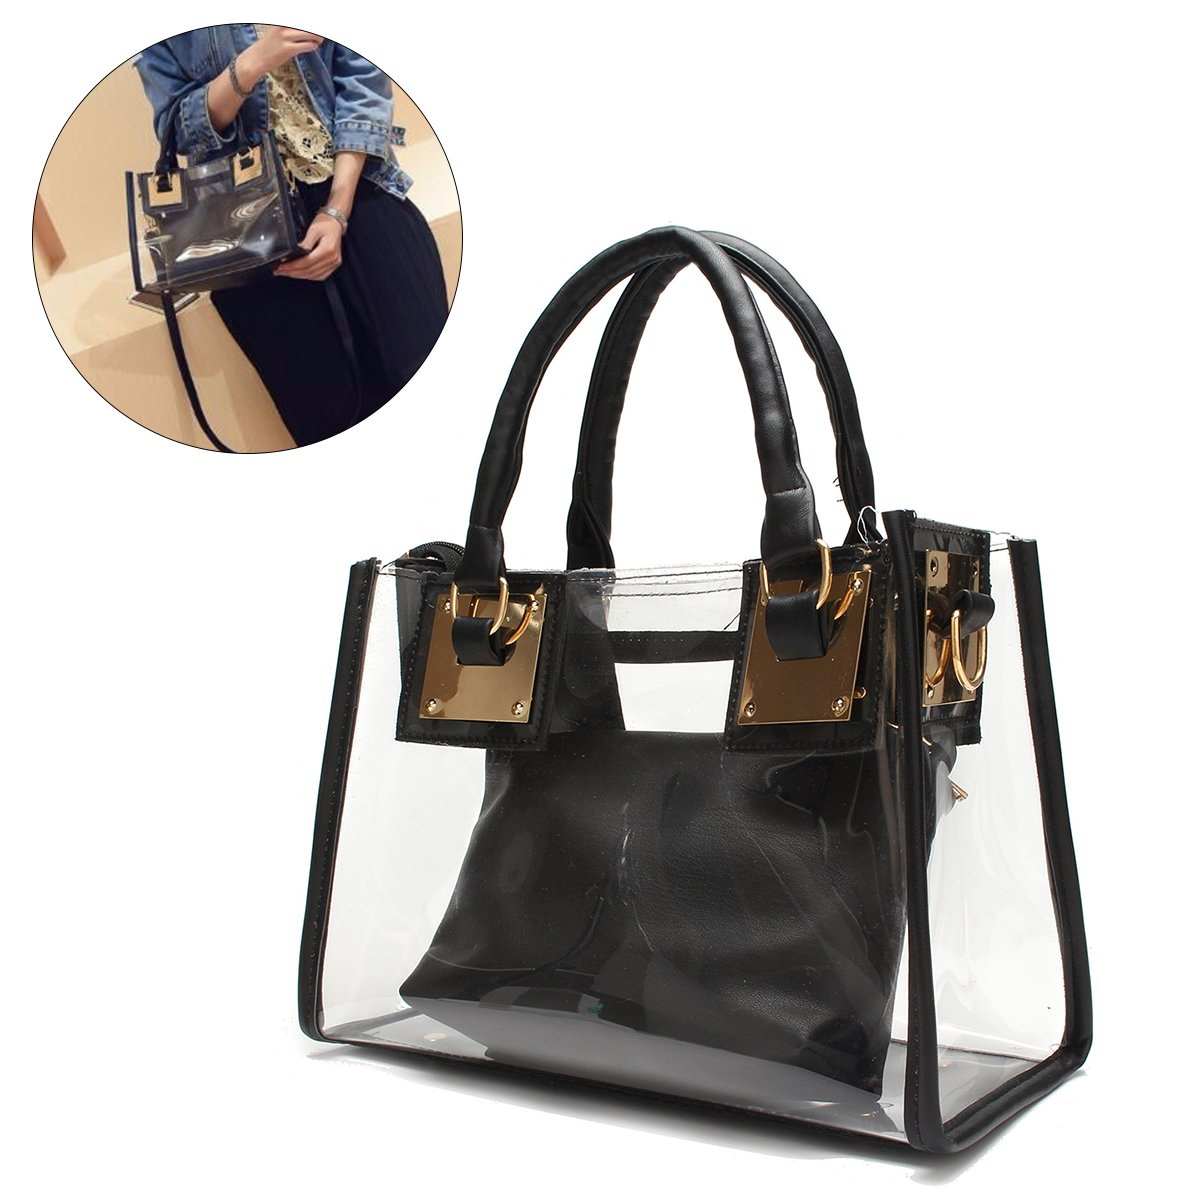 Clear Crossbody Handbags, OURBAG Fashion Women's Waterproof Clear Handbag Top Handle Shoulder Bag Transparent Purse Black